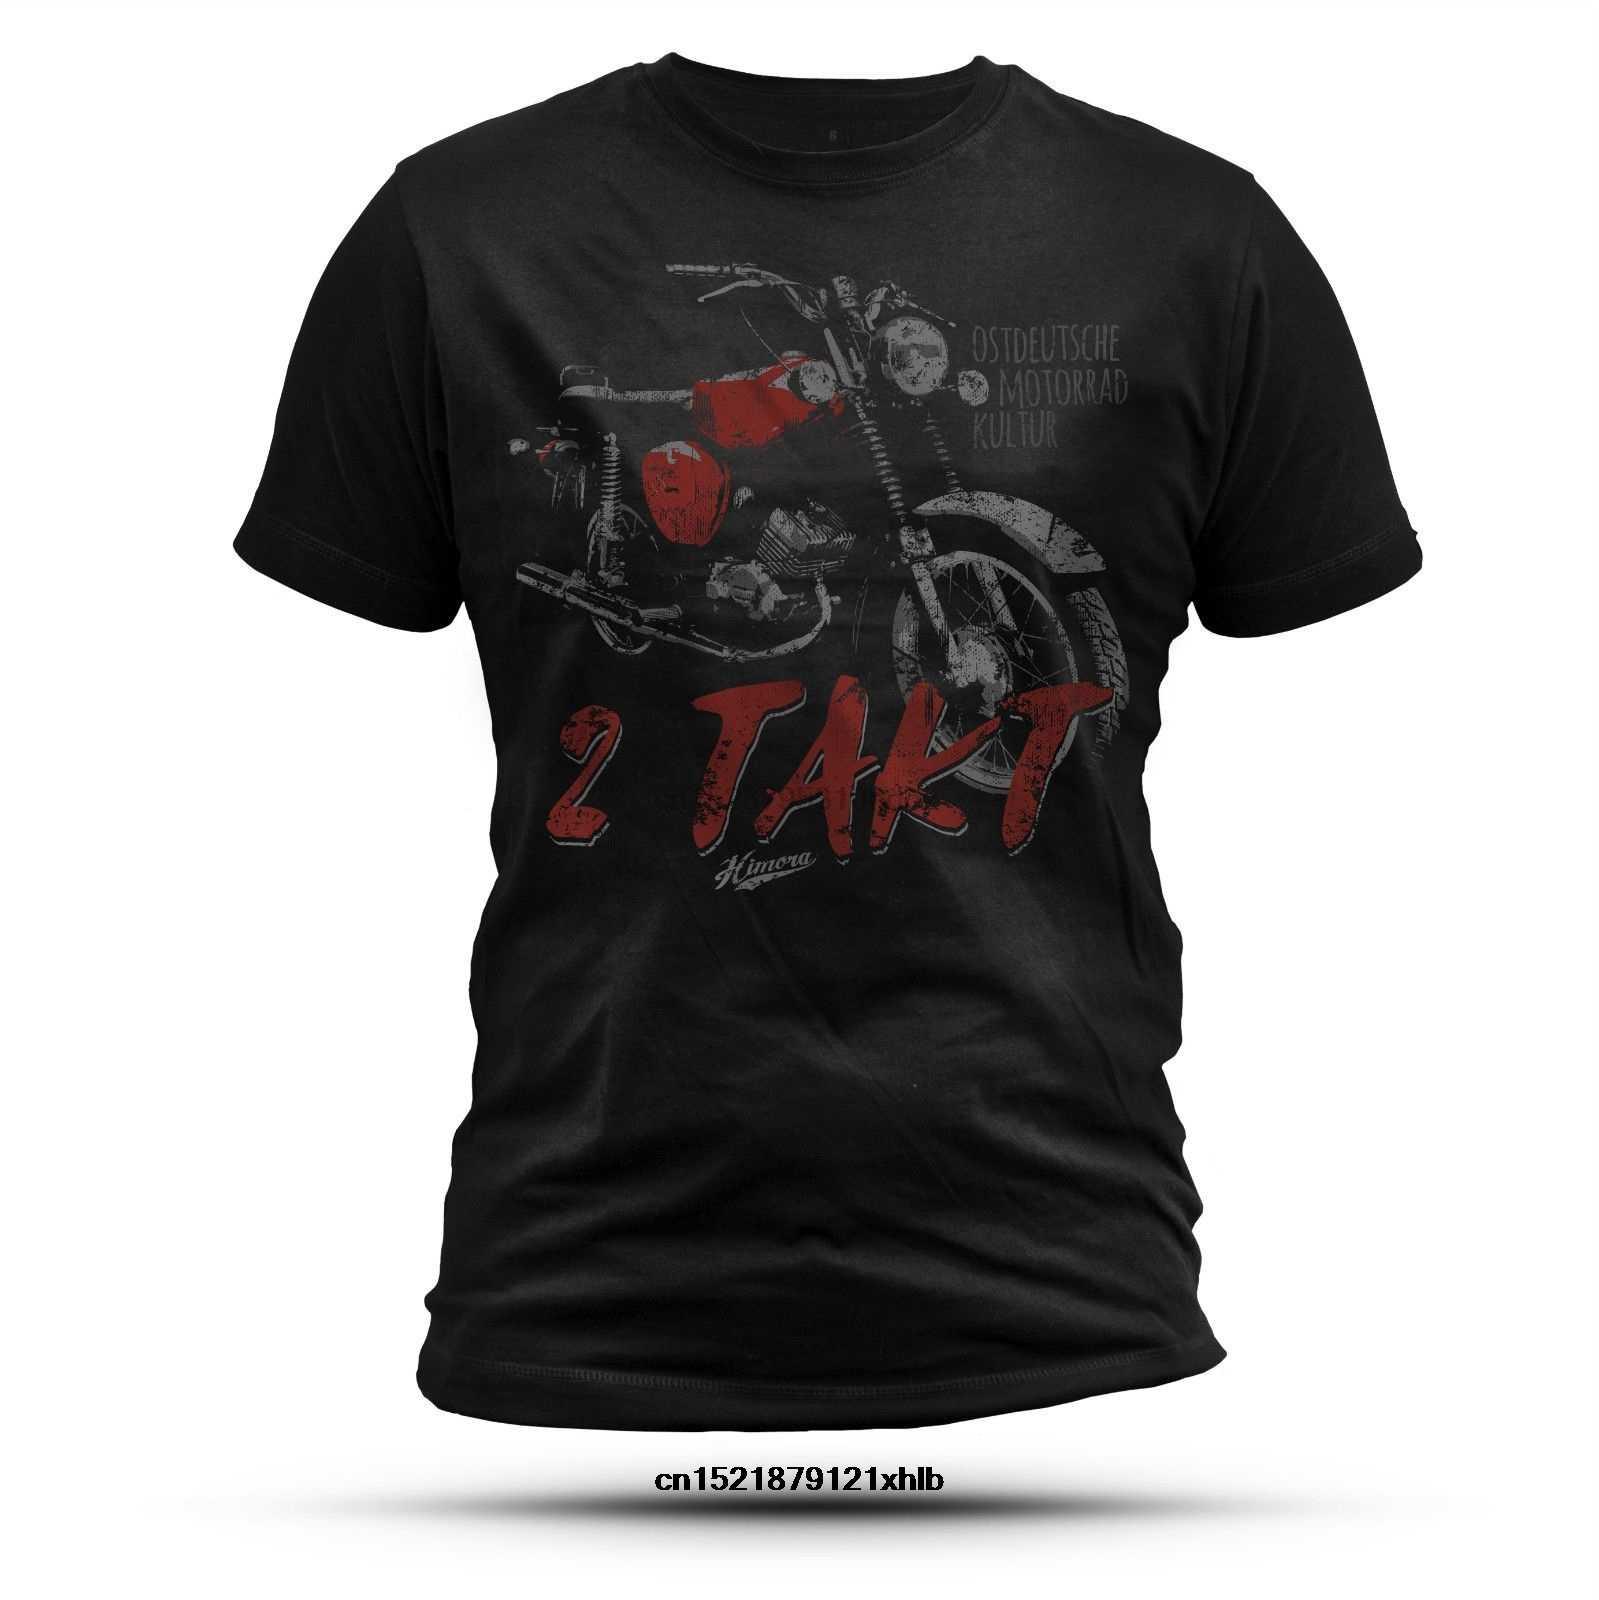 Camiseta masculina 2 takt s51 ostdeutsche motorrad kultur camiseta gráfica topos simson 2 tempos ddr moped simme akf suhl motor